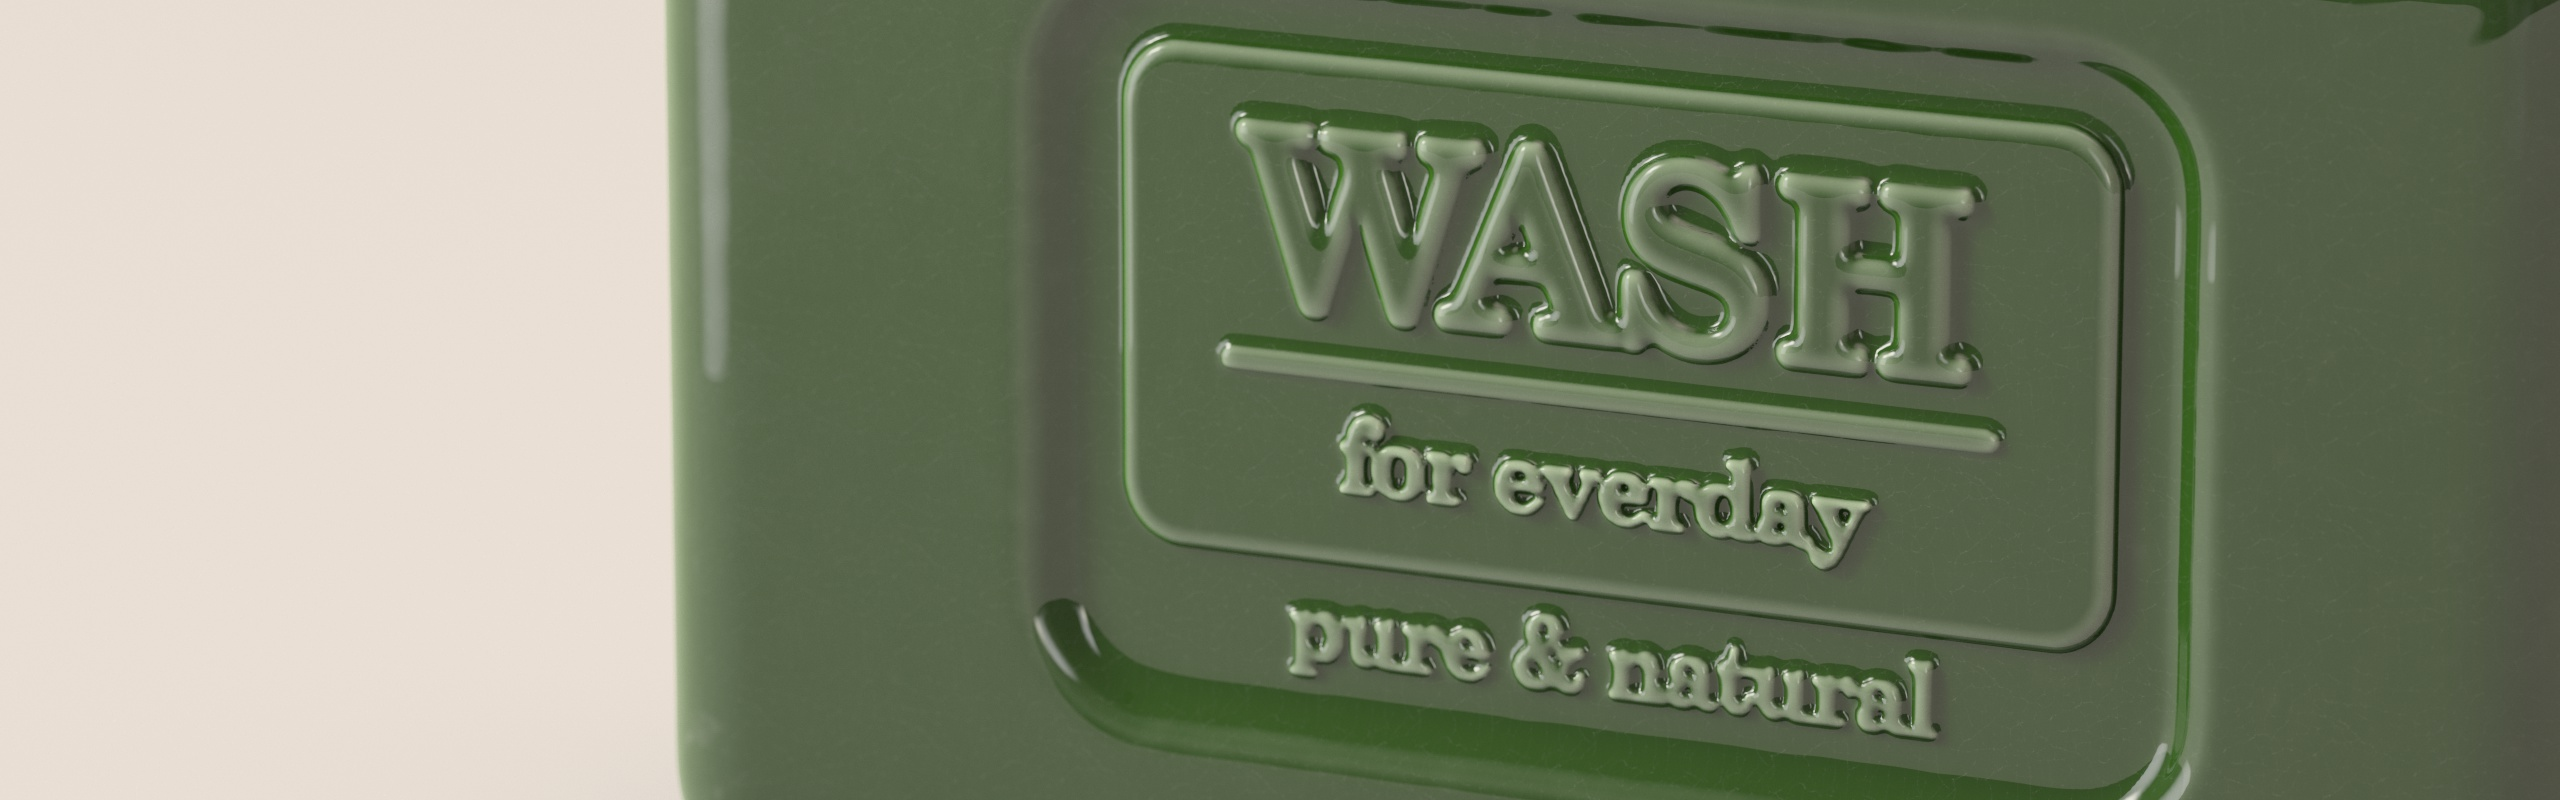 Zara Soap Dispenser_Green_2021-01-18_3_.